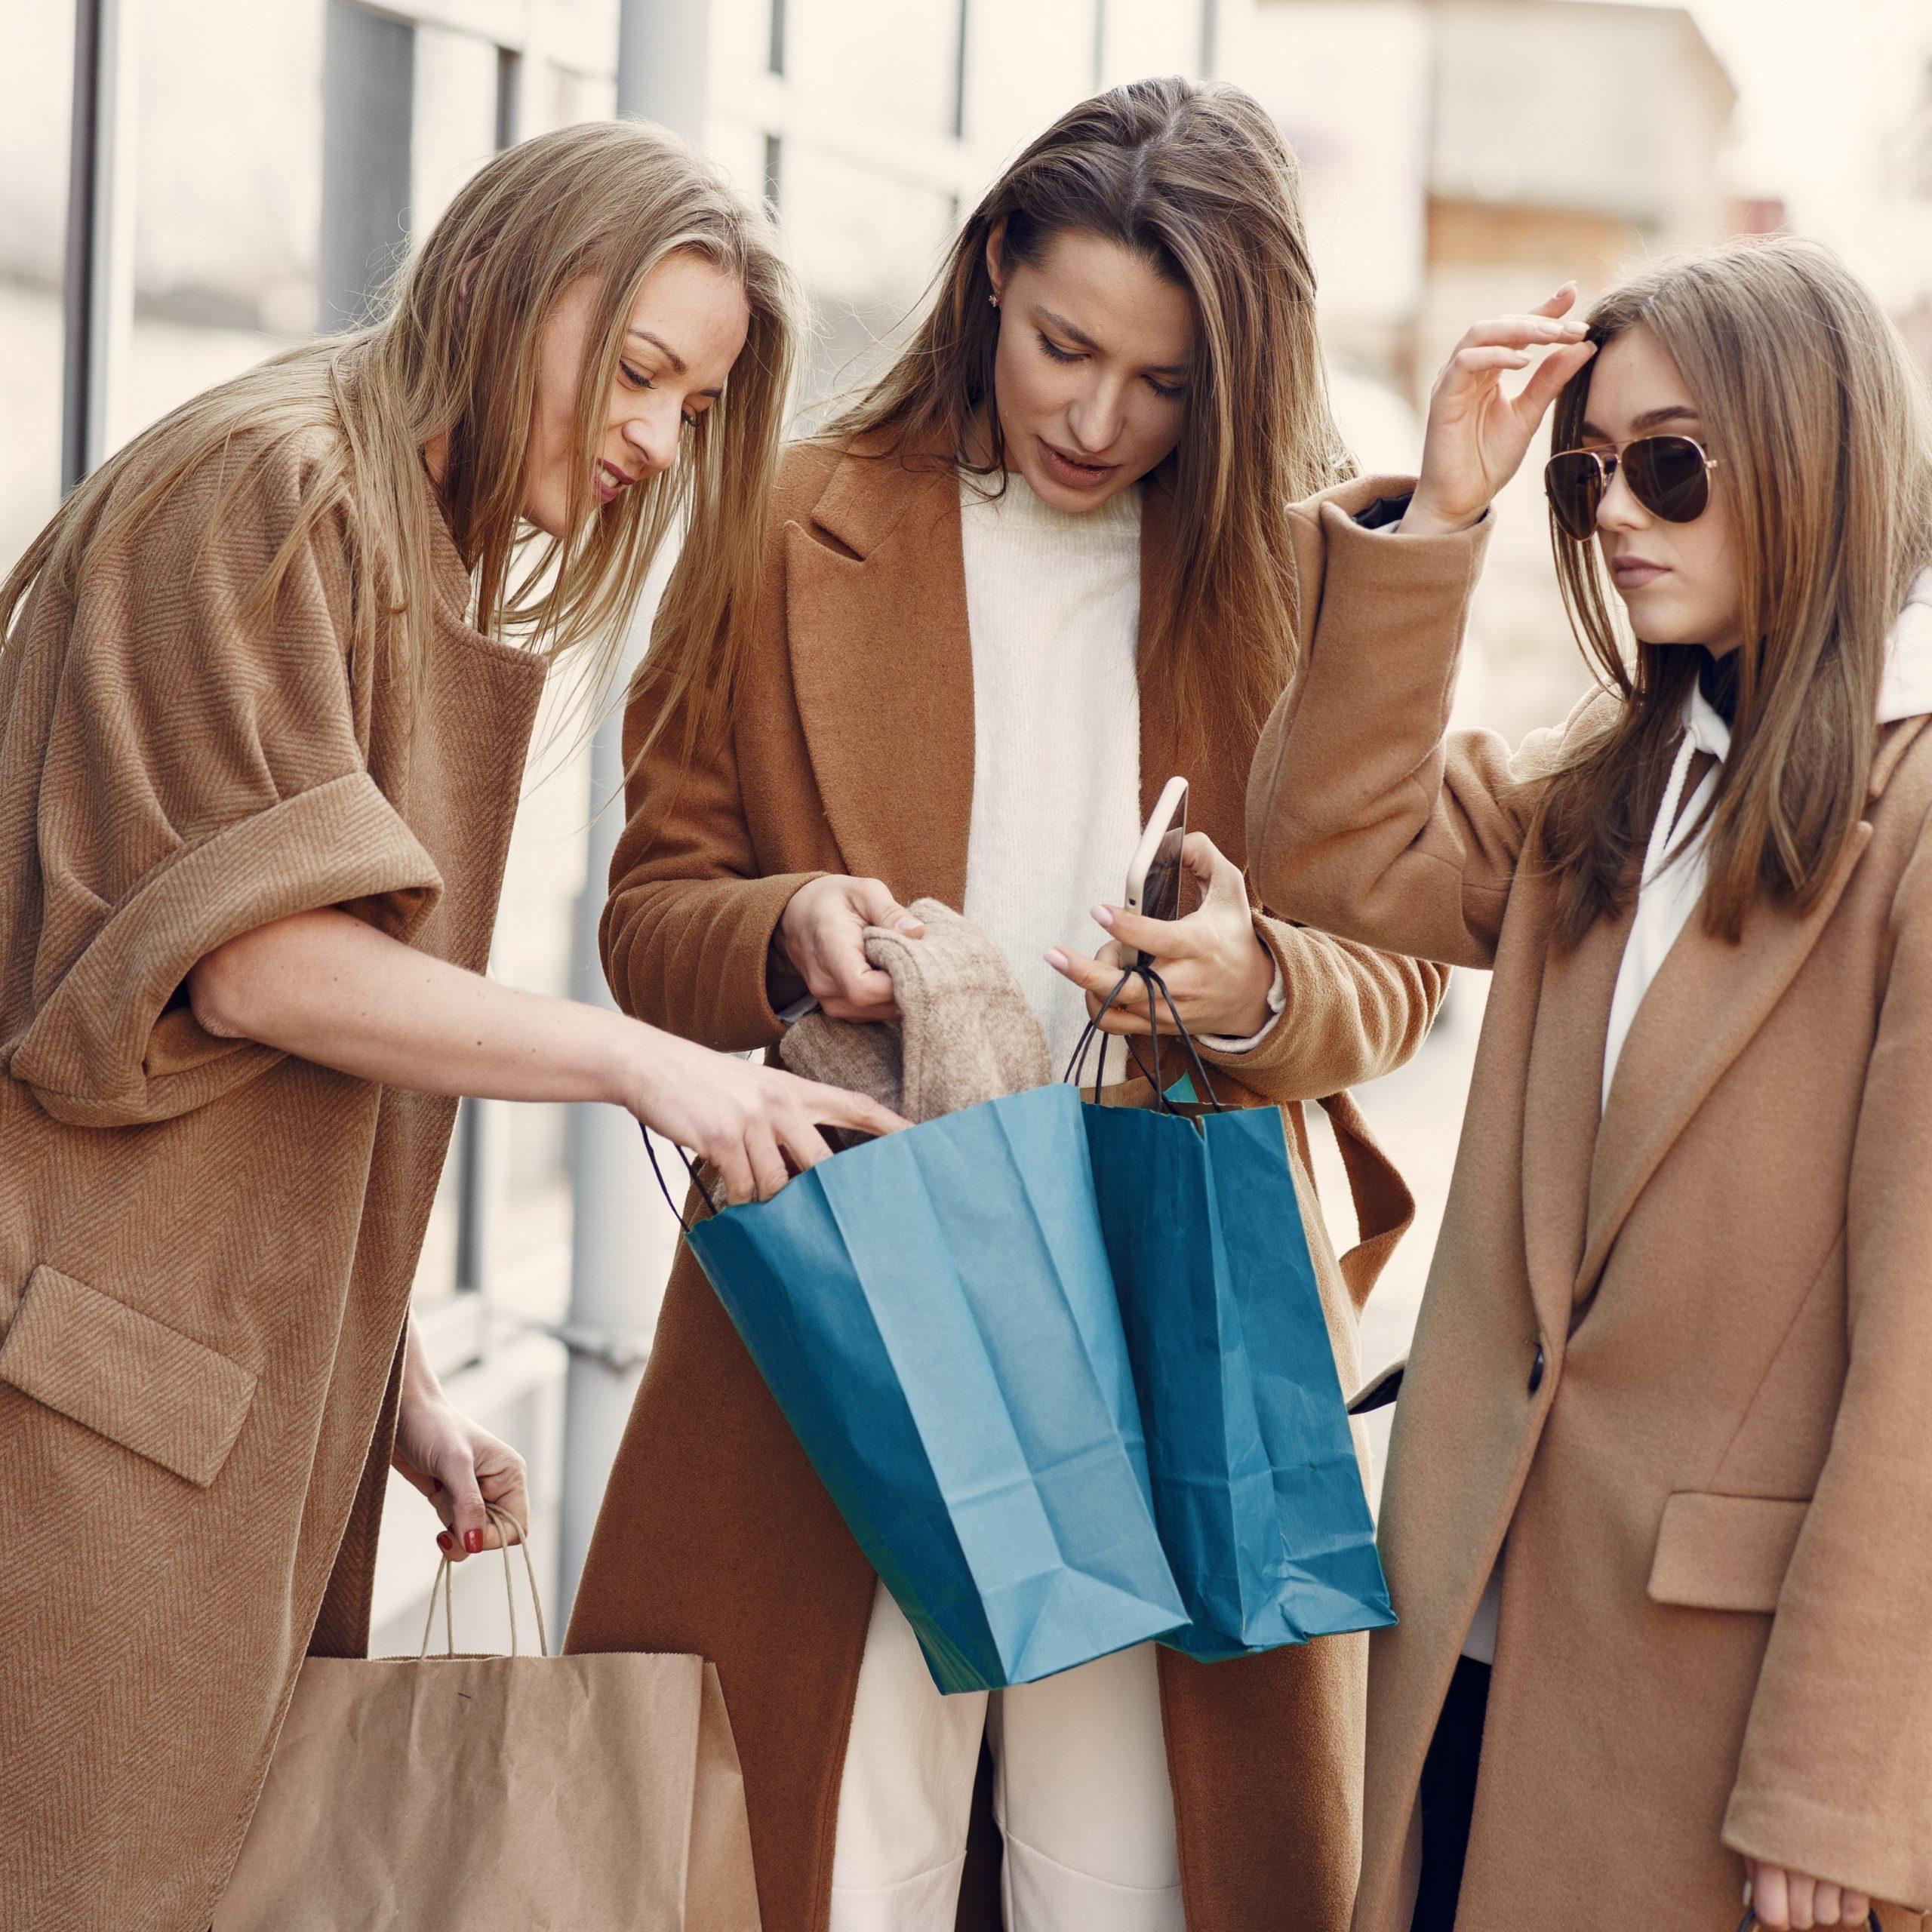 Fashion Shopping Friends